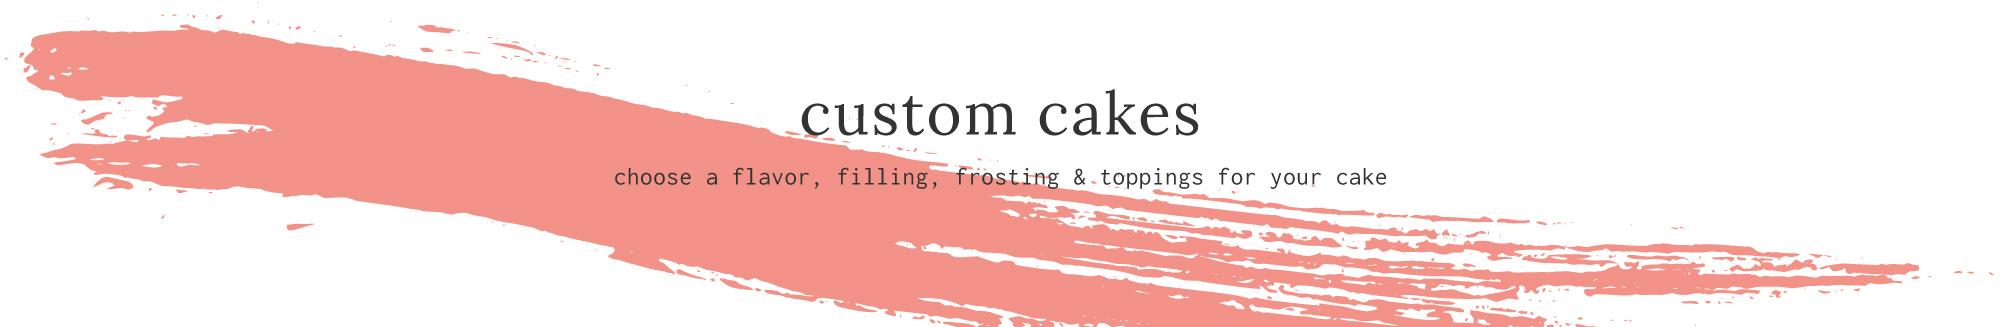 Cake Life Custom Cakes